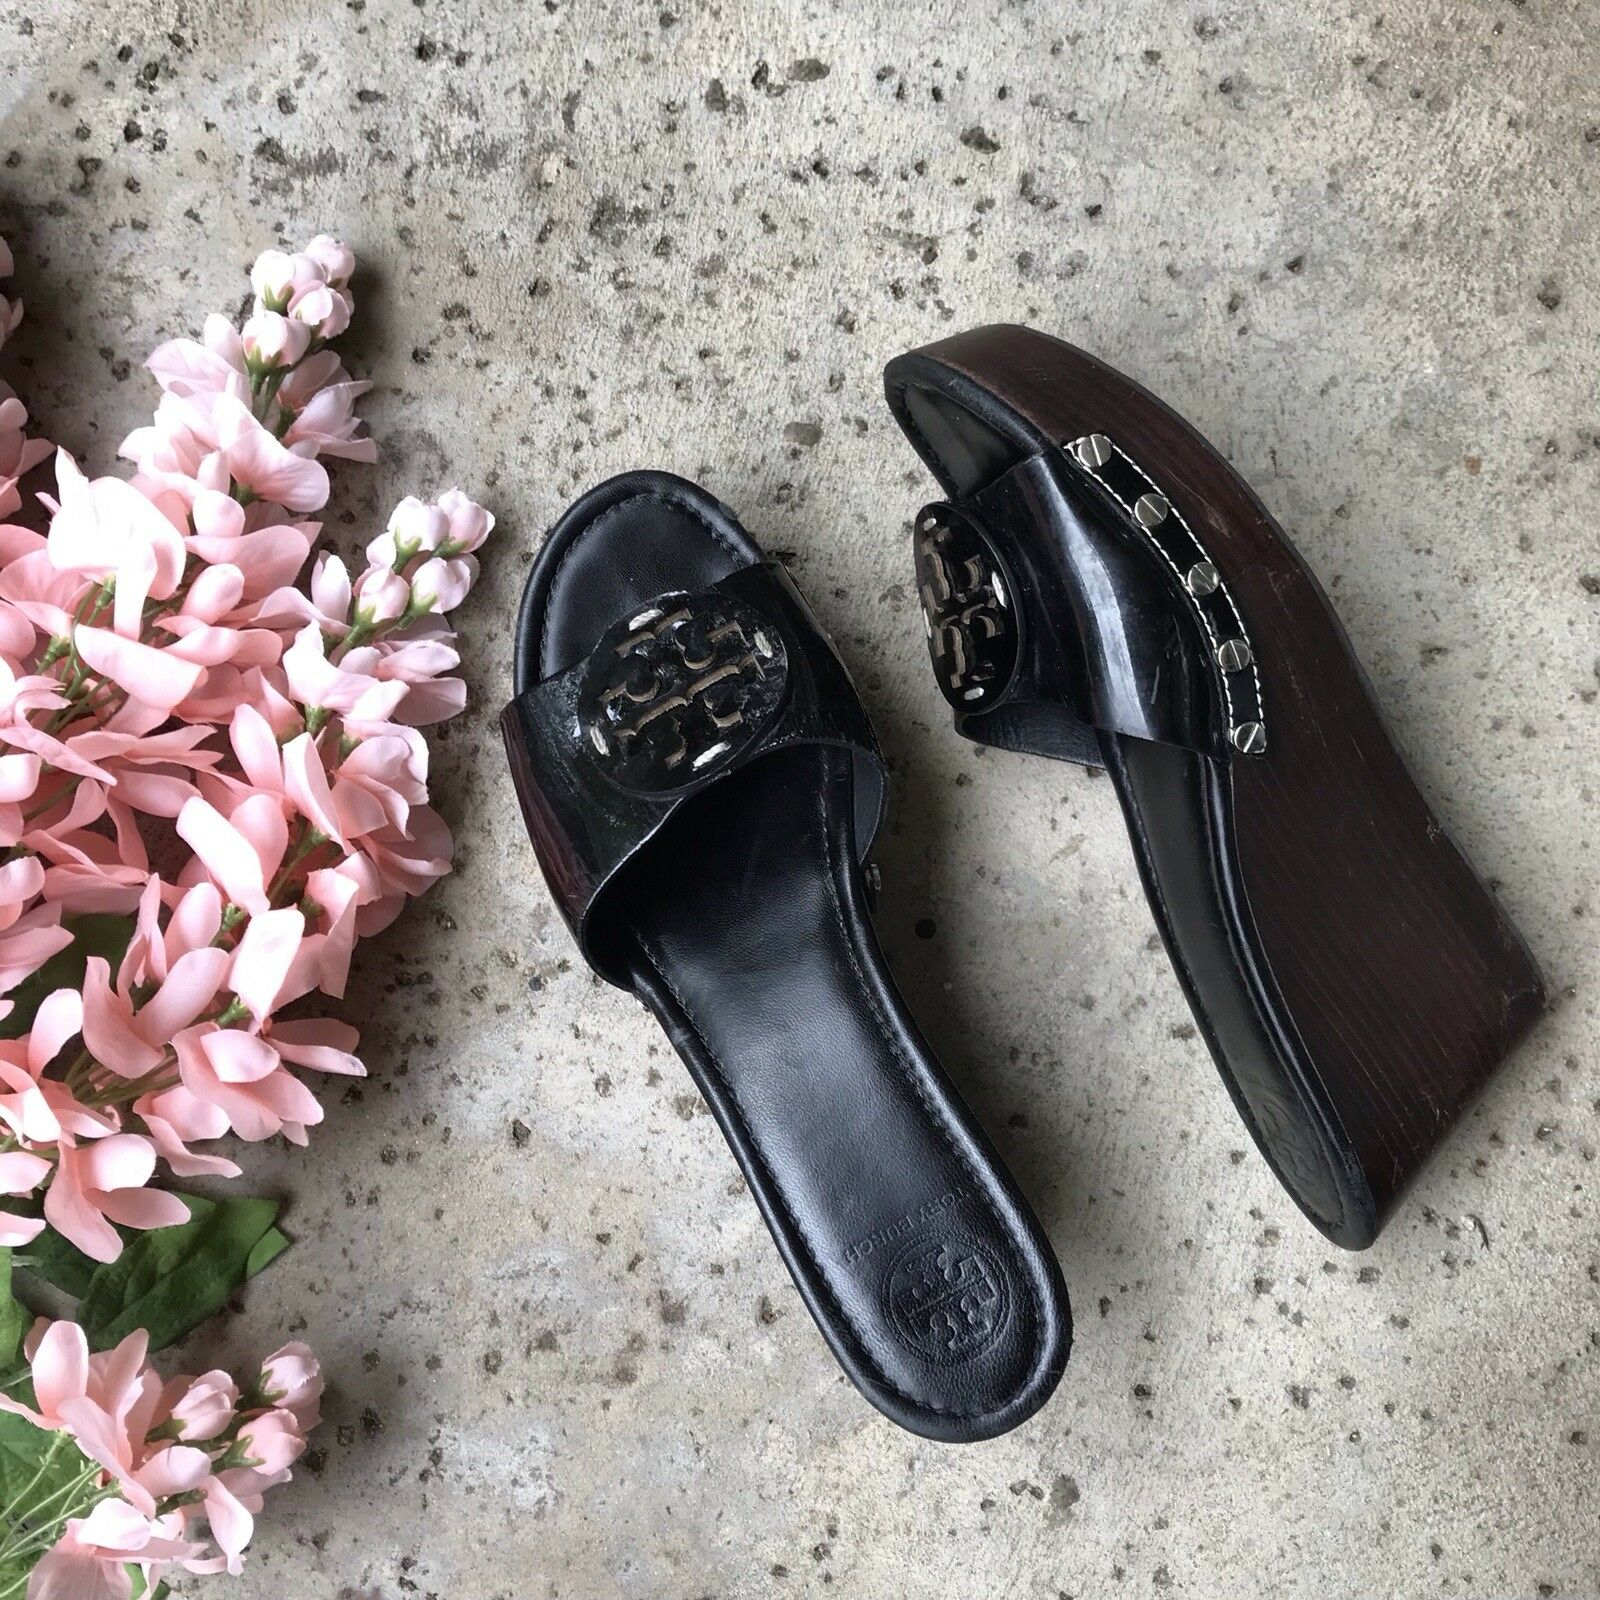 TORY BURCH Patti Black Wedge Sandal shoes Sz 9.5